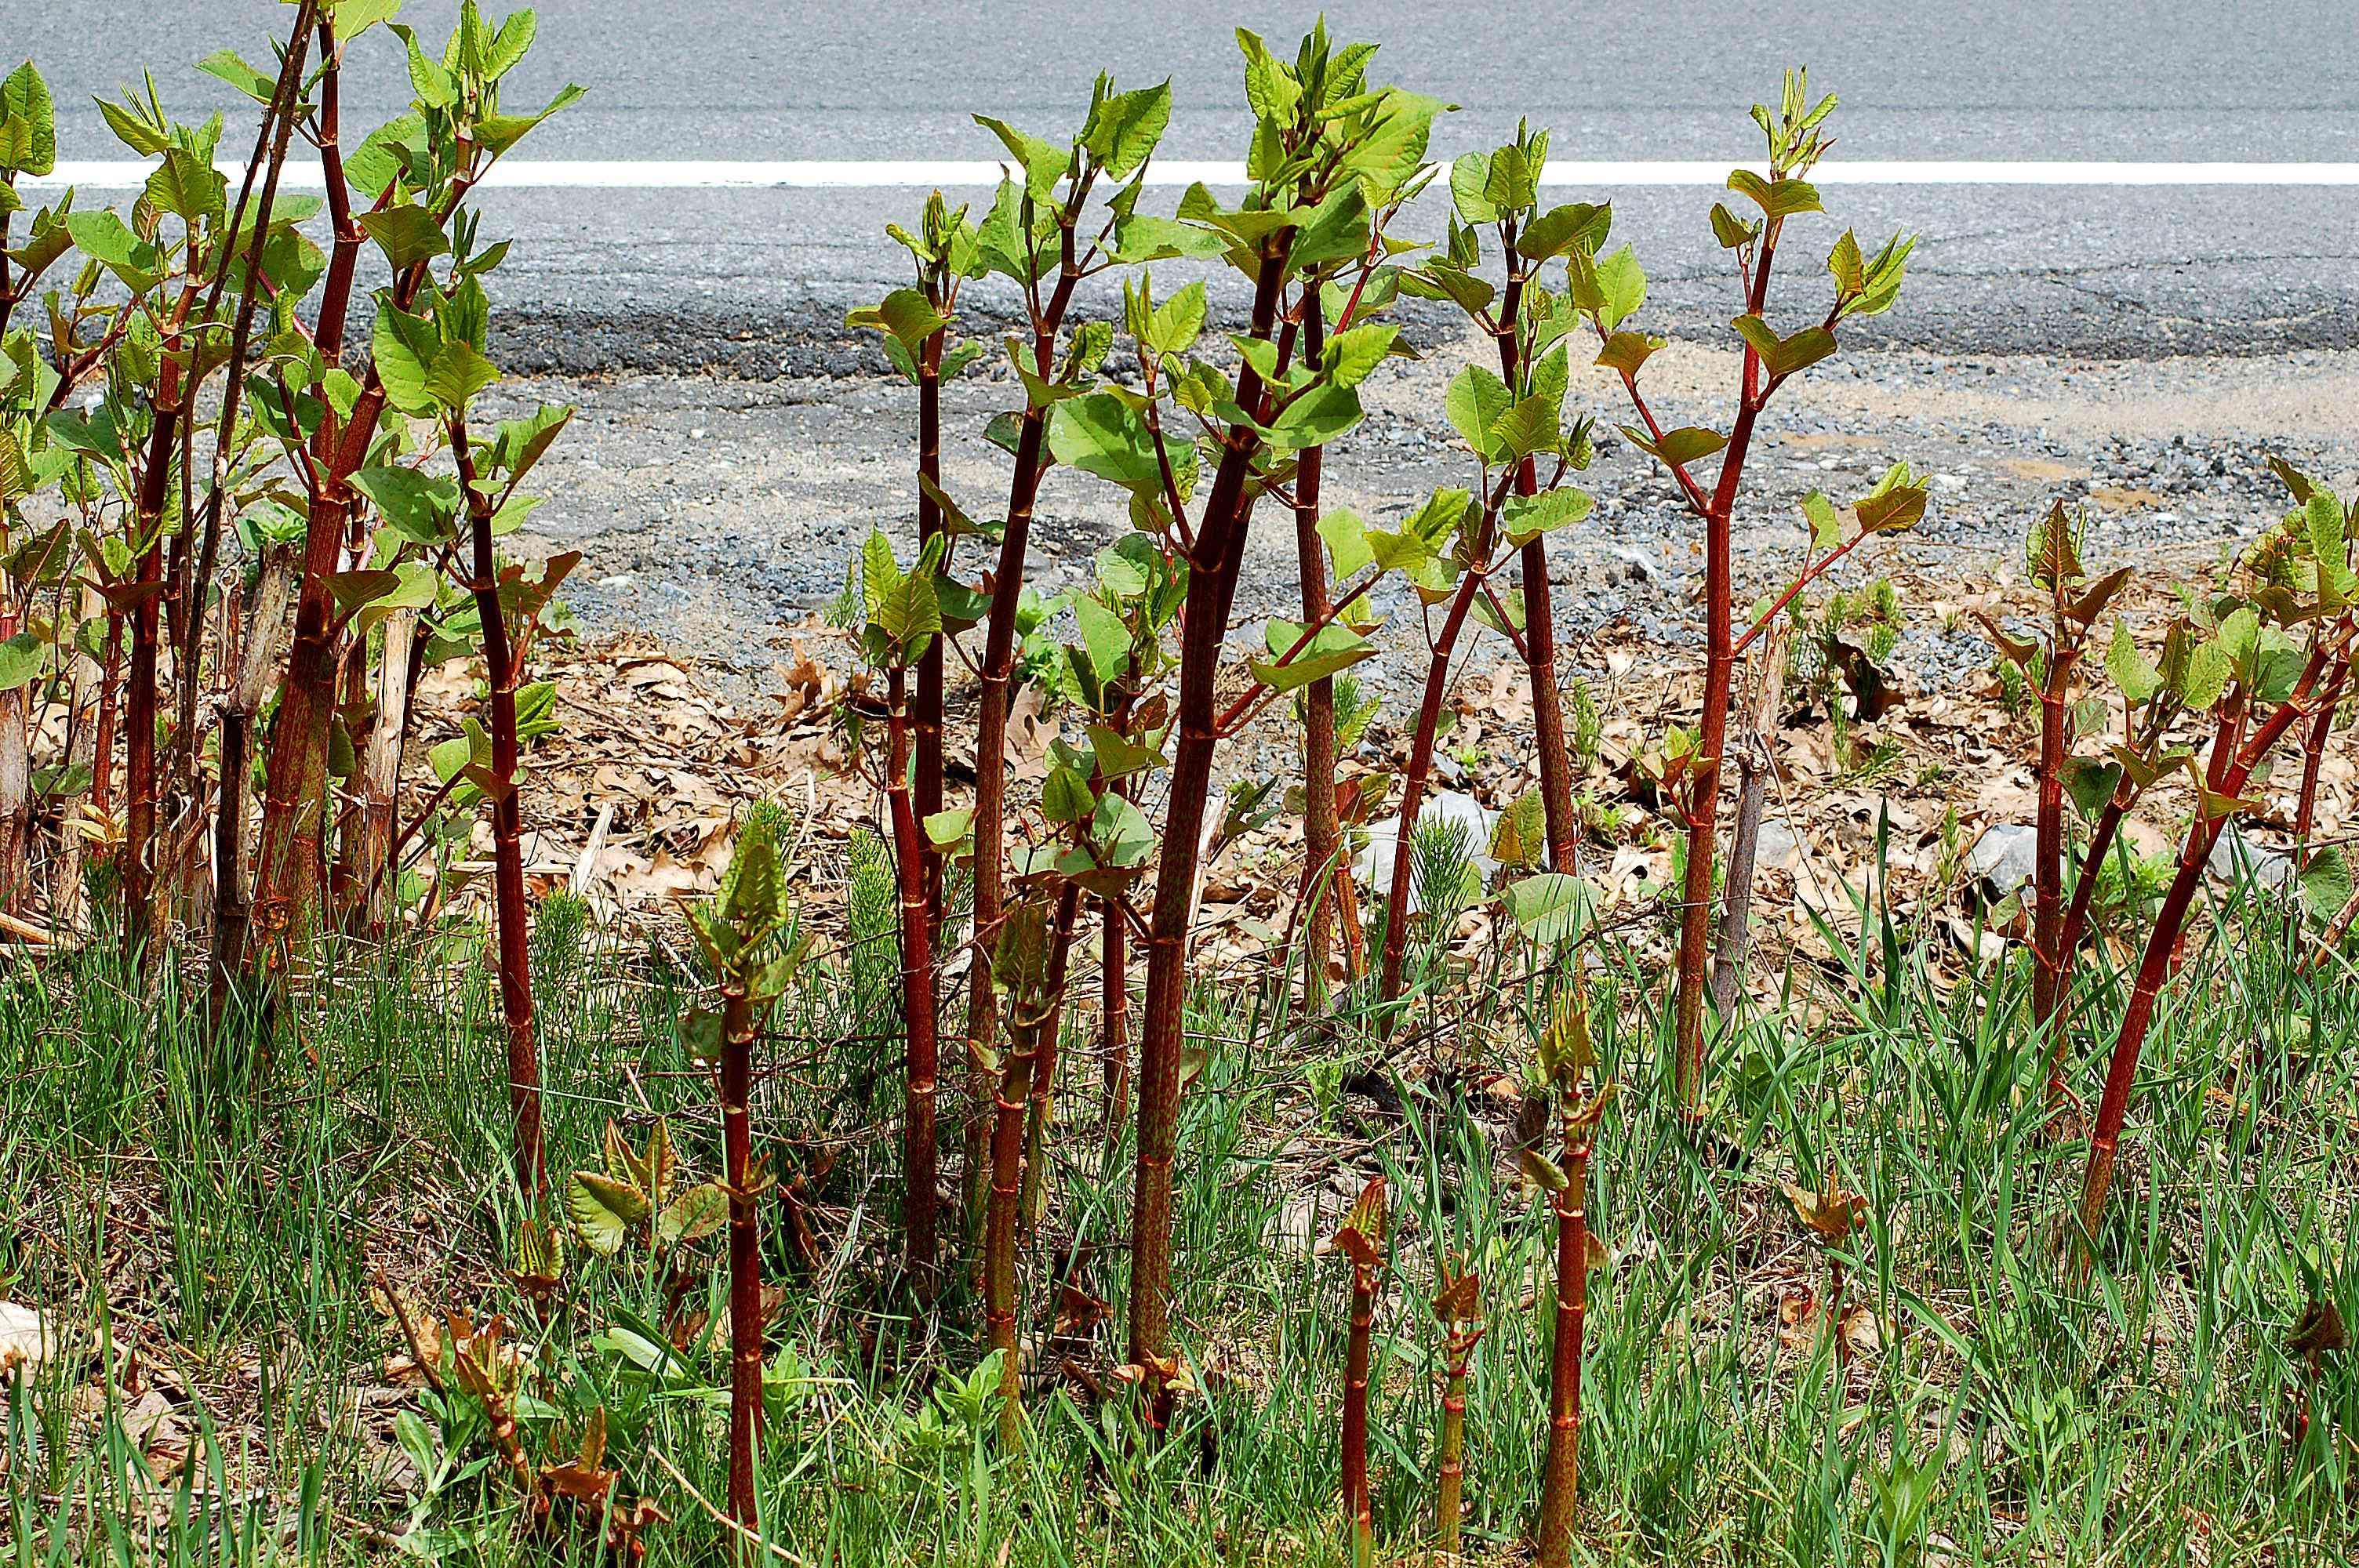 Japanese knotweed growing near a road.